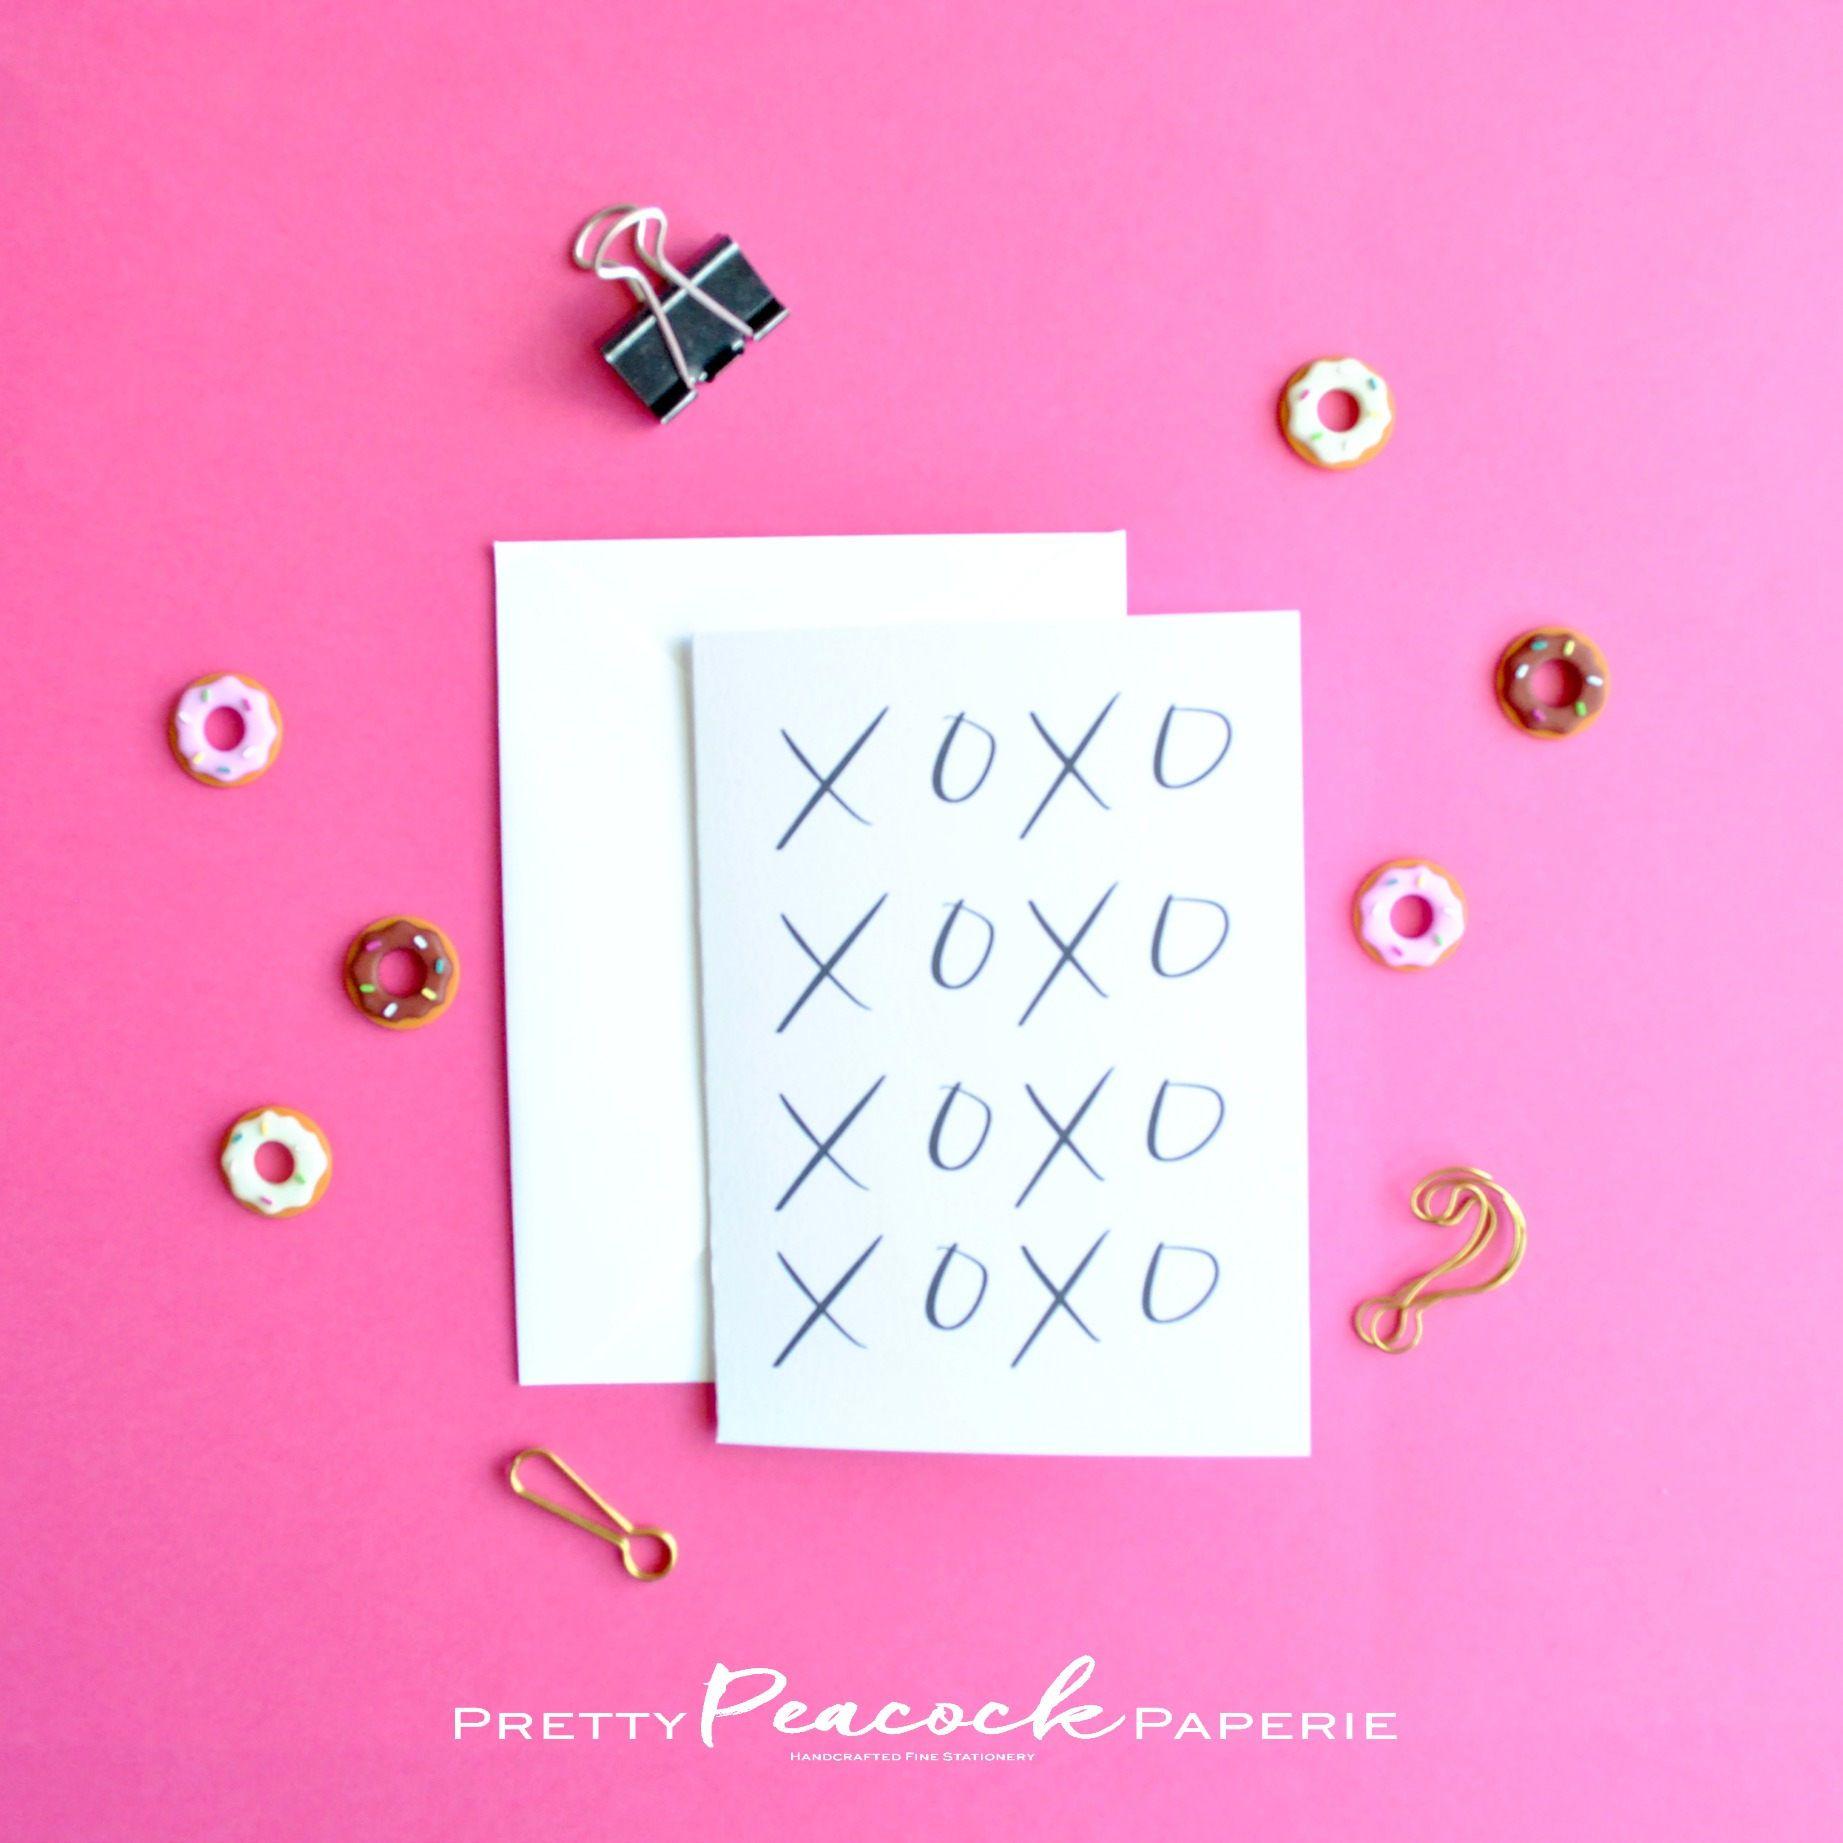 Xoxo greeting card love cards love greeting card wedding greeting xoxo greeting card love cards love greeting card wedding greeting card anniversary kristyandbryce Choice Image